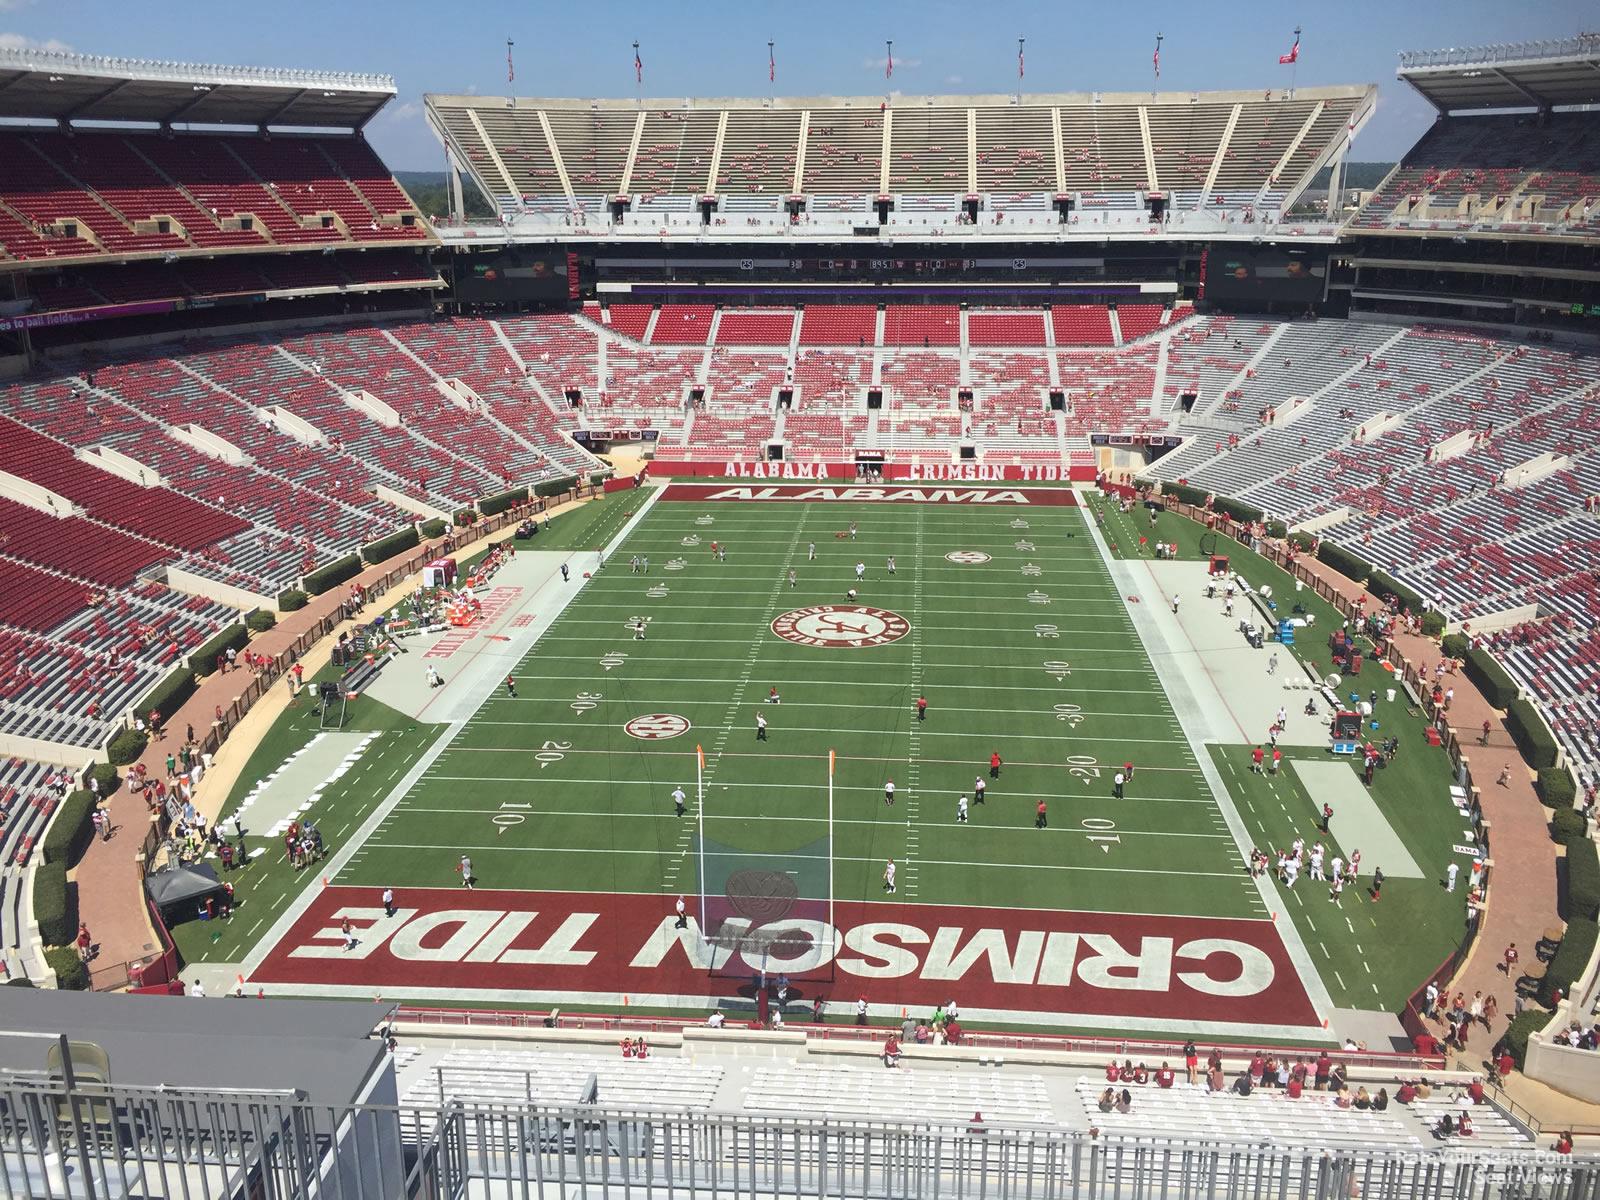 Alabama line and kick off time